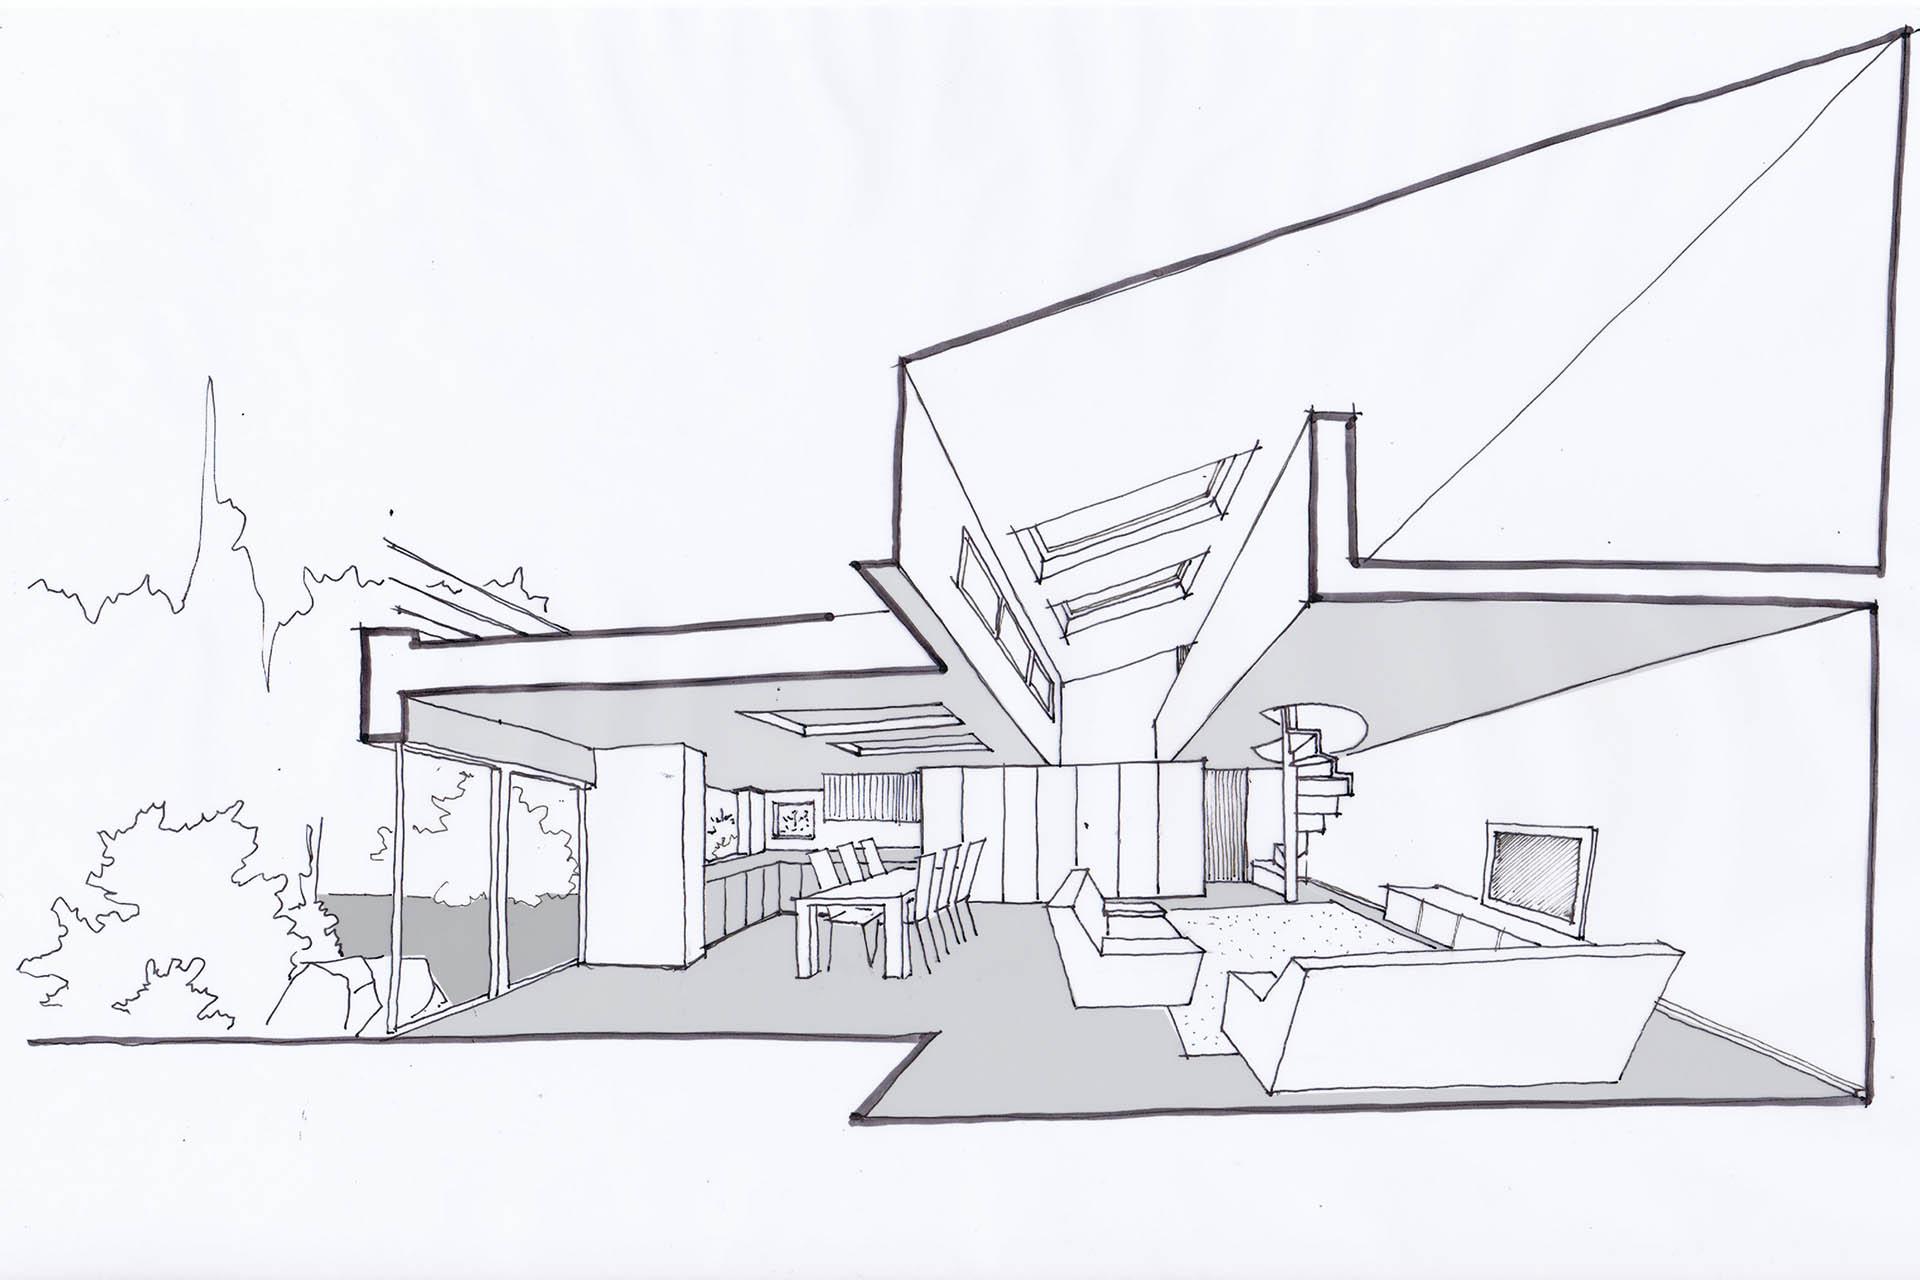 interieur maison en perspective. Black Bedroom Furniture Sets. Home Design Ideas